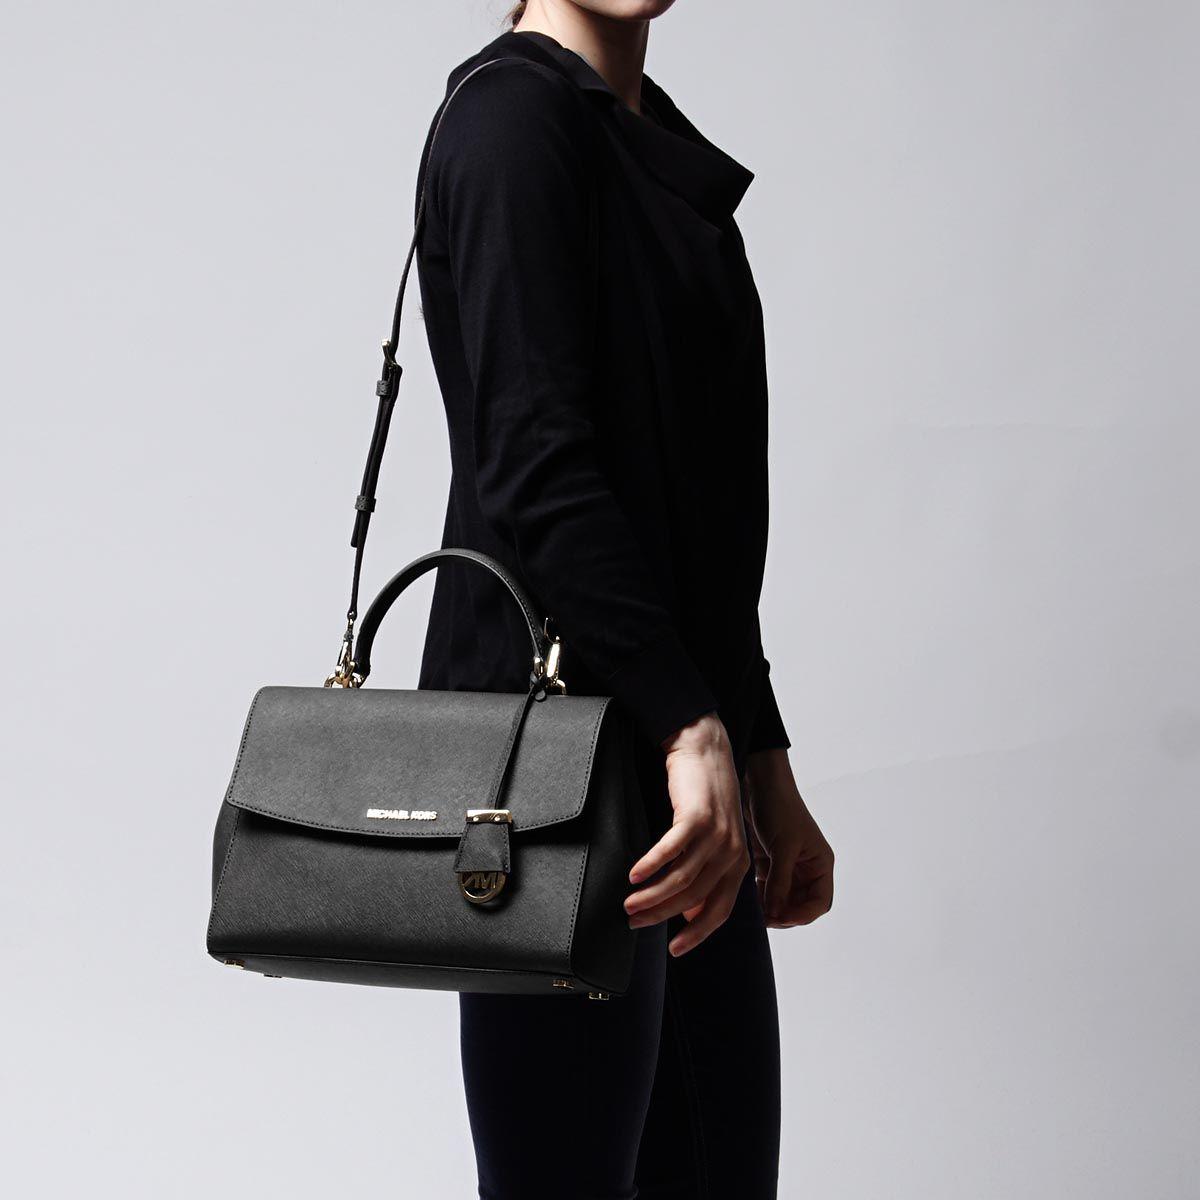 25eee16e20c2b3 Michael Kors MICHAEL MICHAEL KORS handbag (2WAY specifications) AVA LEATHER BLACK  black system 30t5gavs3l 001 Lady's